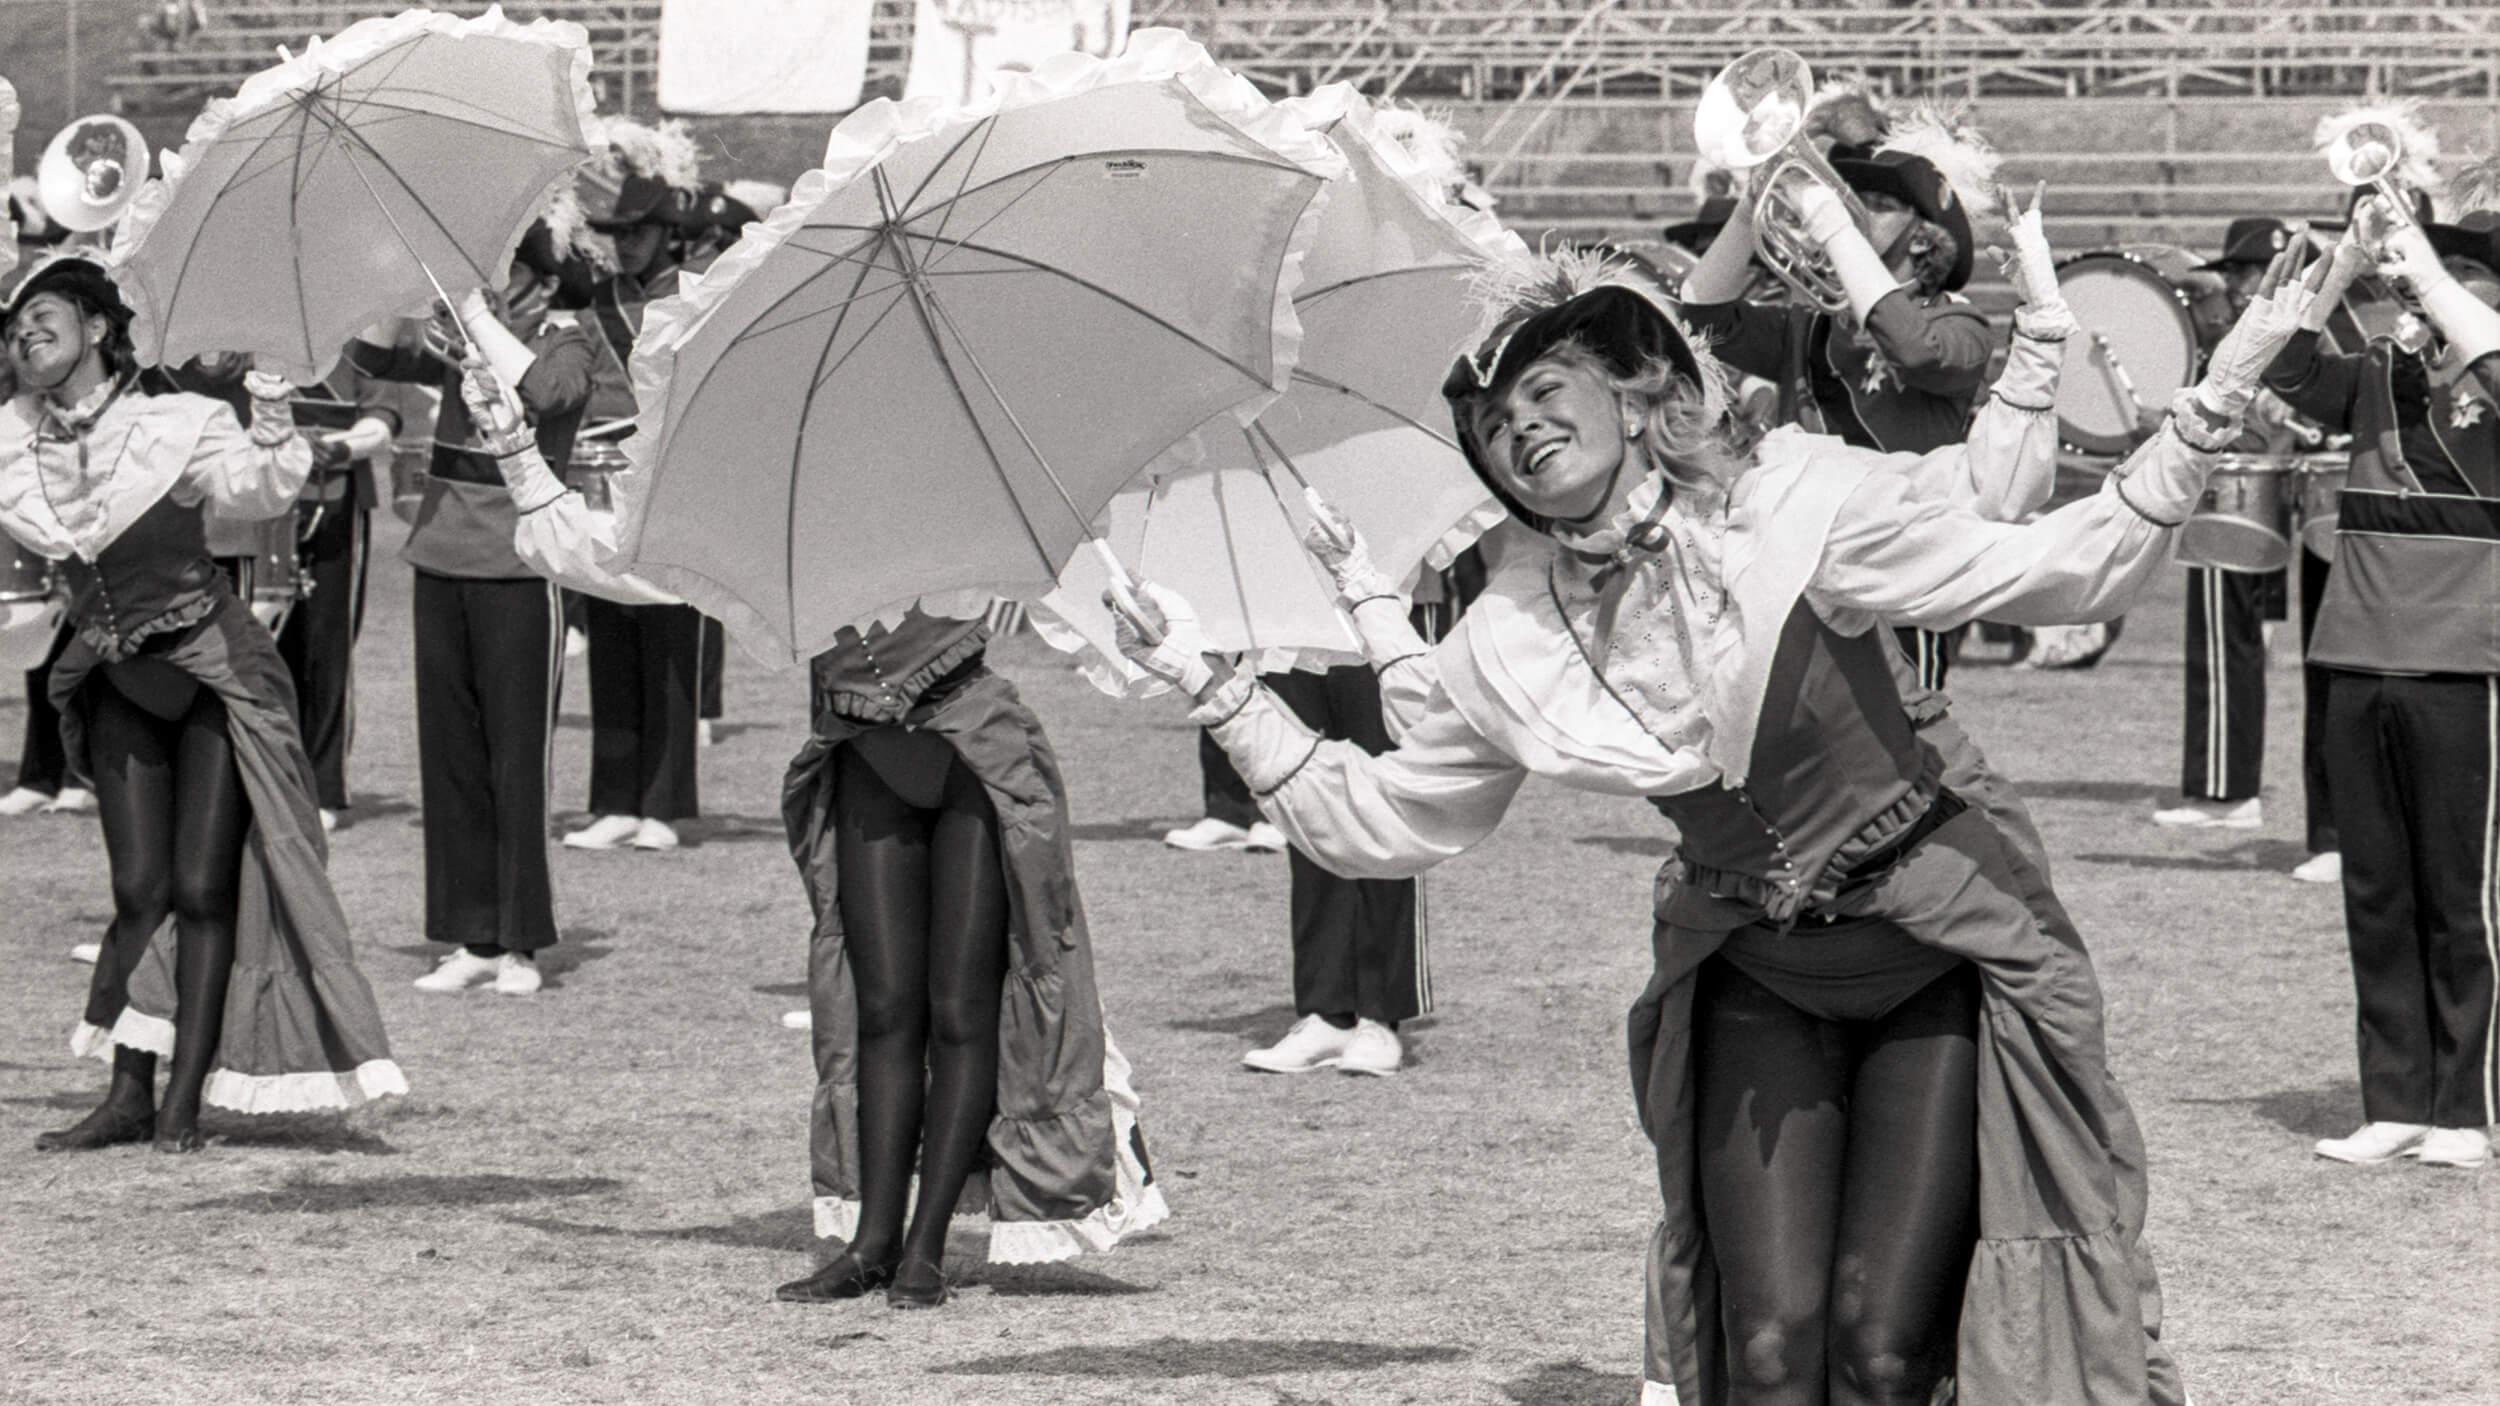 1984 Santa Clara Vanguard